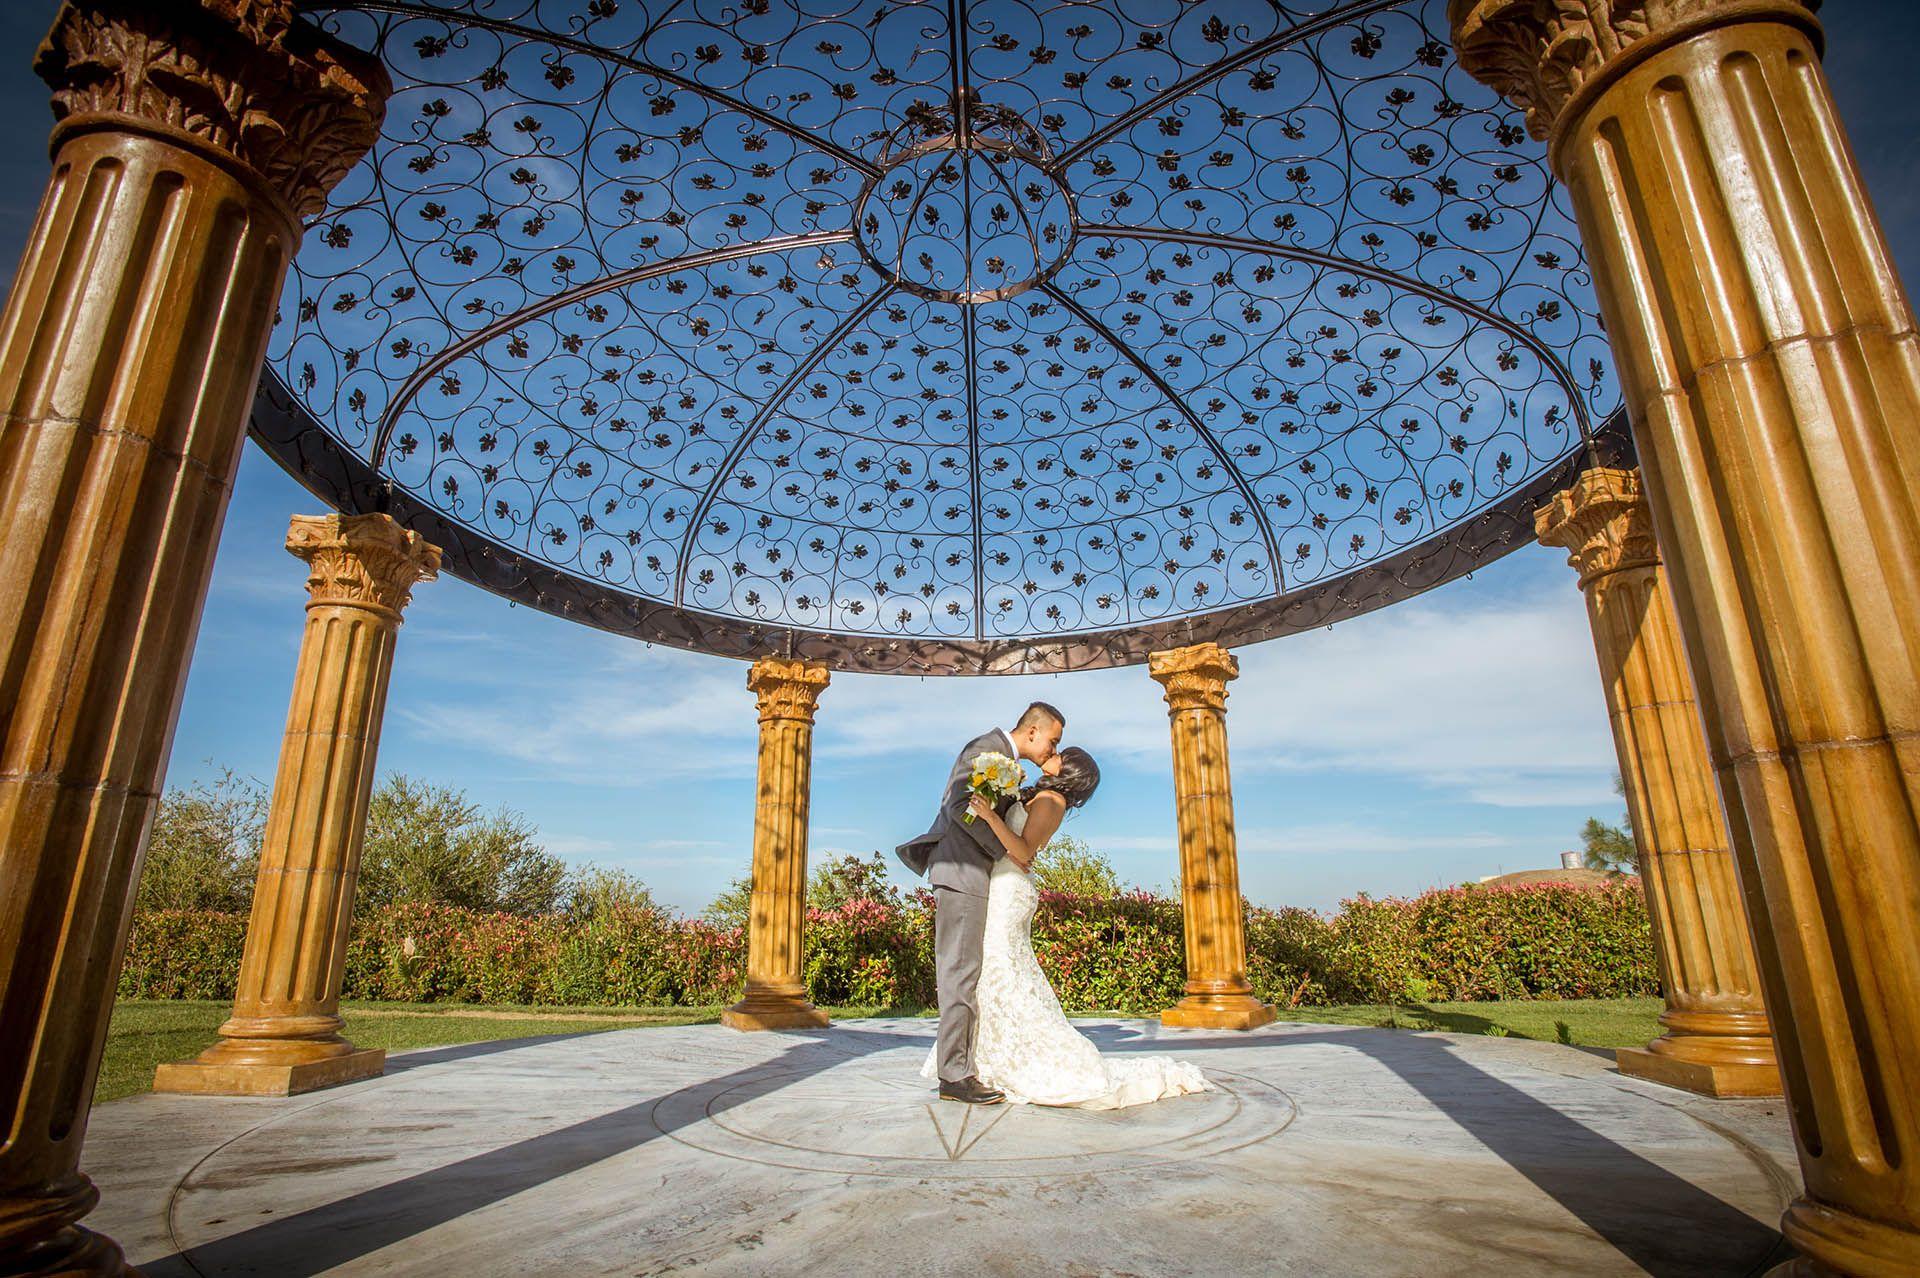 Gazebo for romantic portraits Estate wedding venue